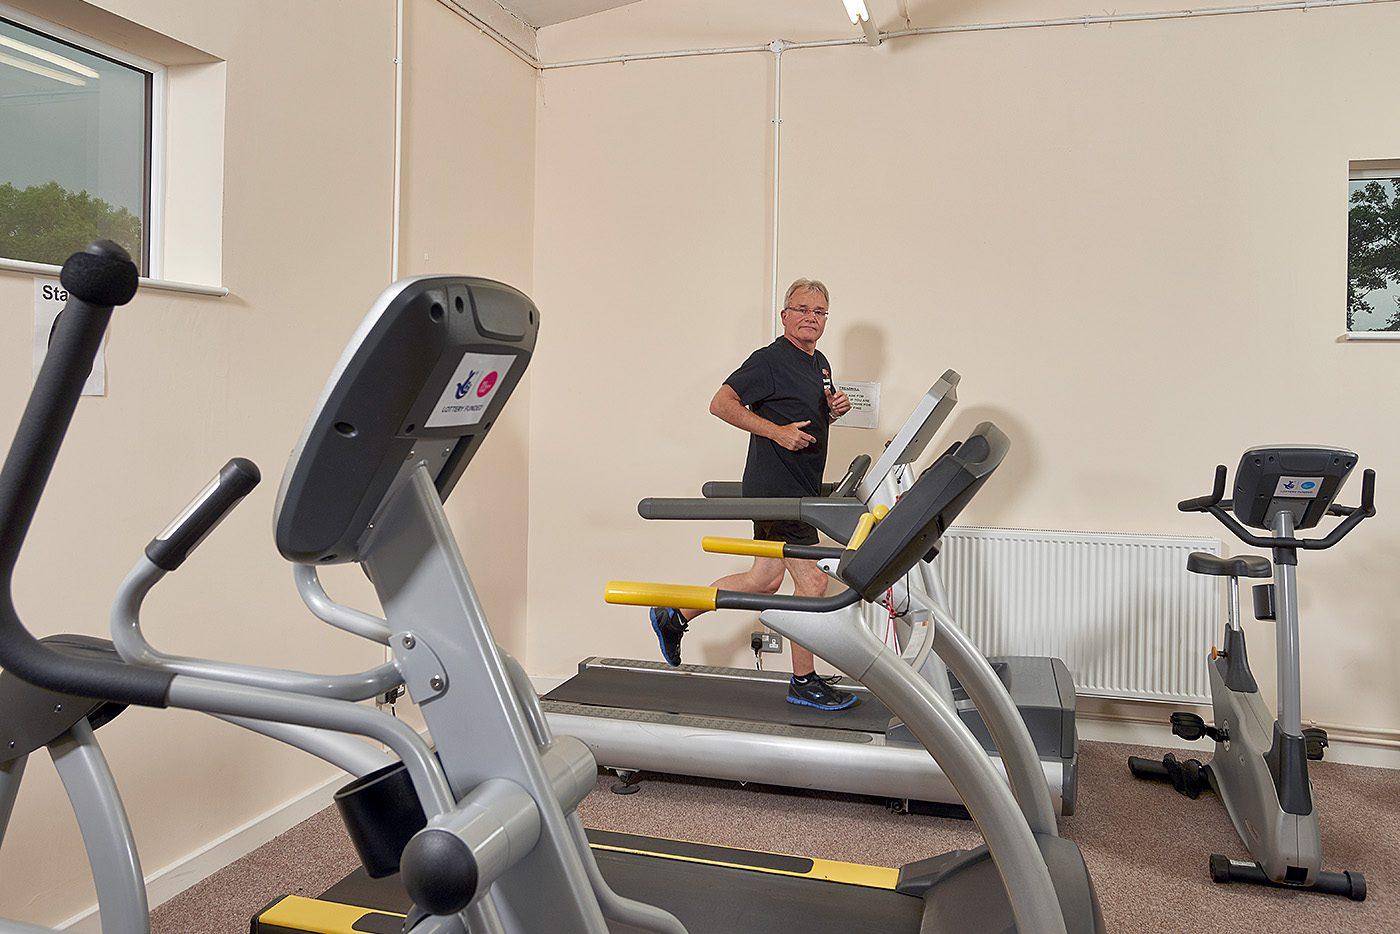 Treadmills at Barnsley LTE Heart Support